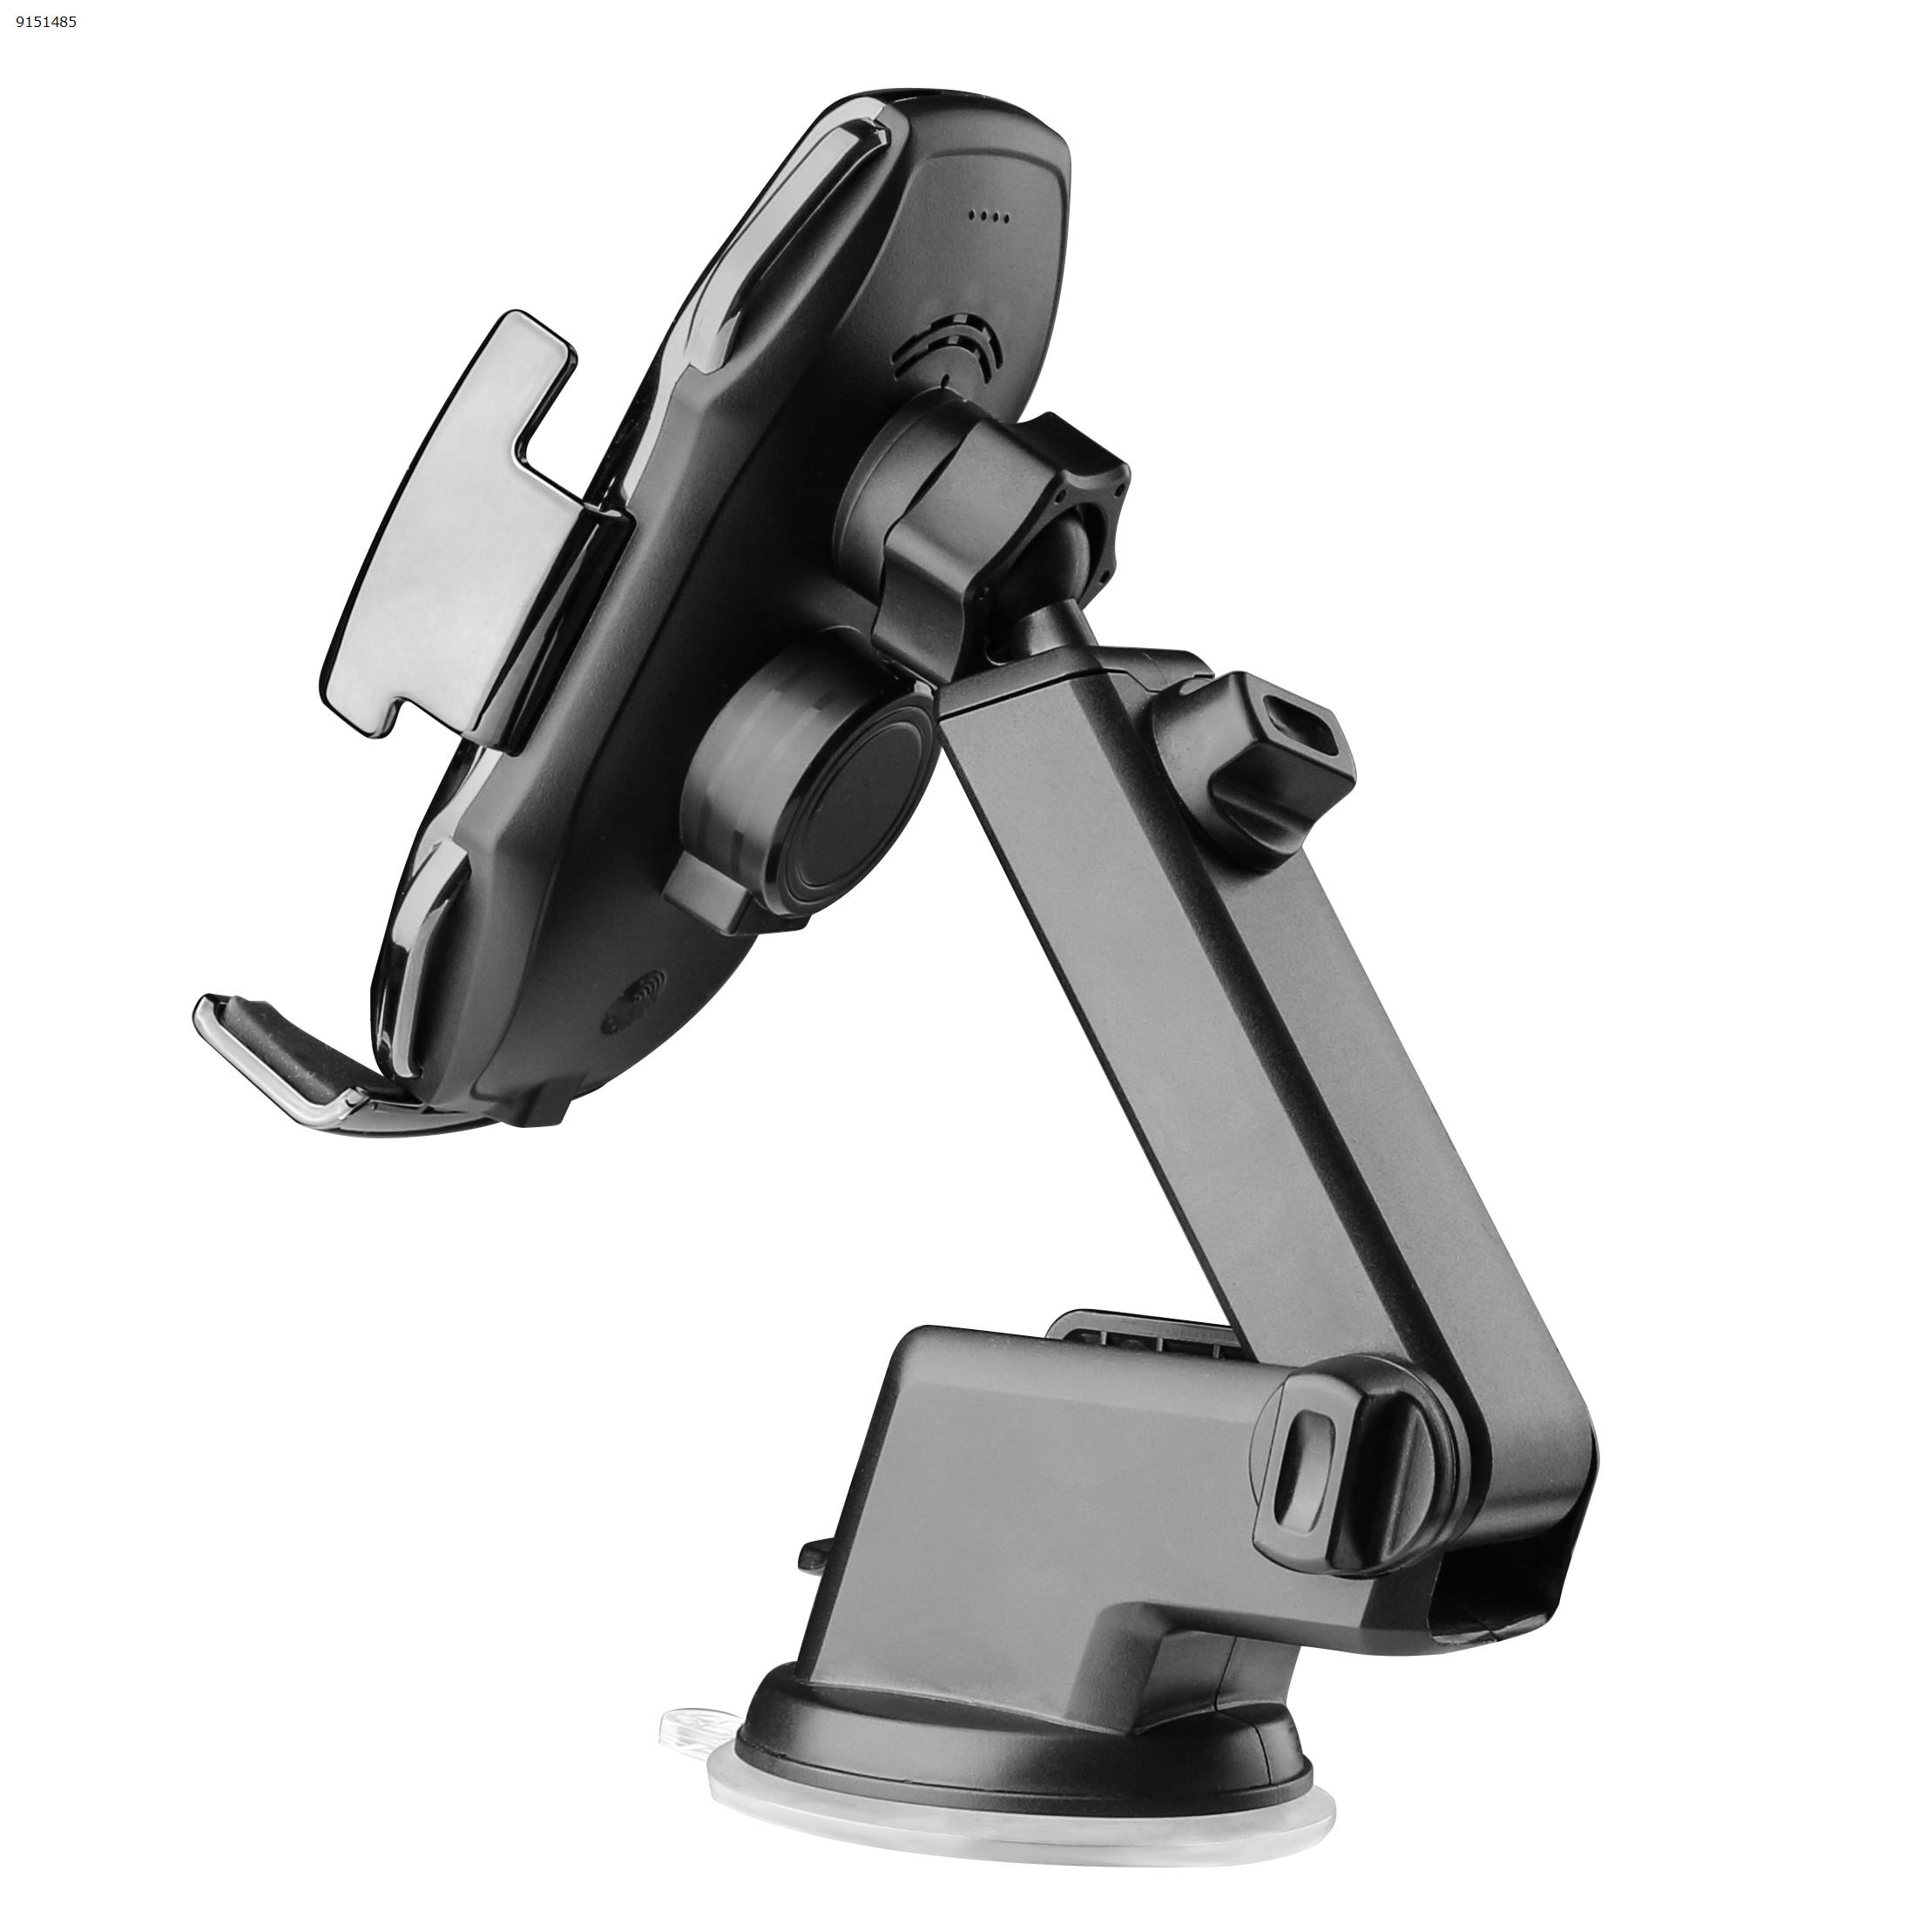 A5 Smart Sensor Car Wireless Charger +Suction Desktop Stand  Black Autocar Decorations A5